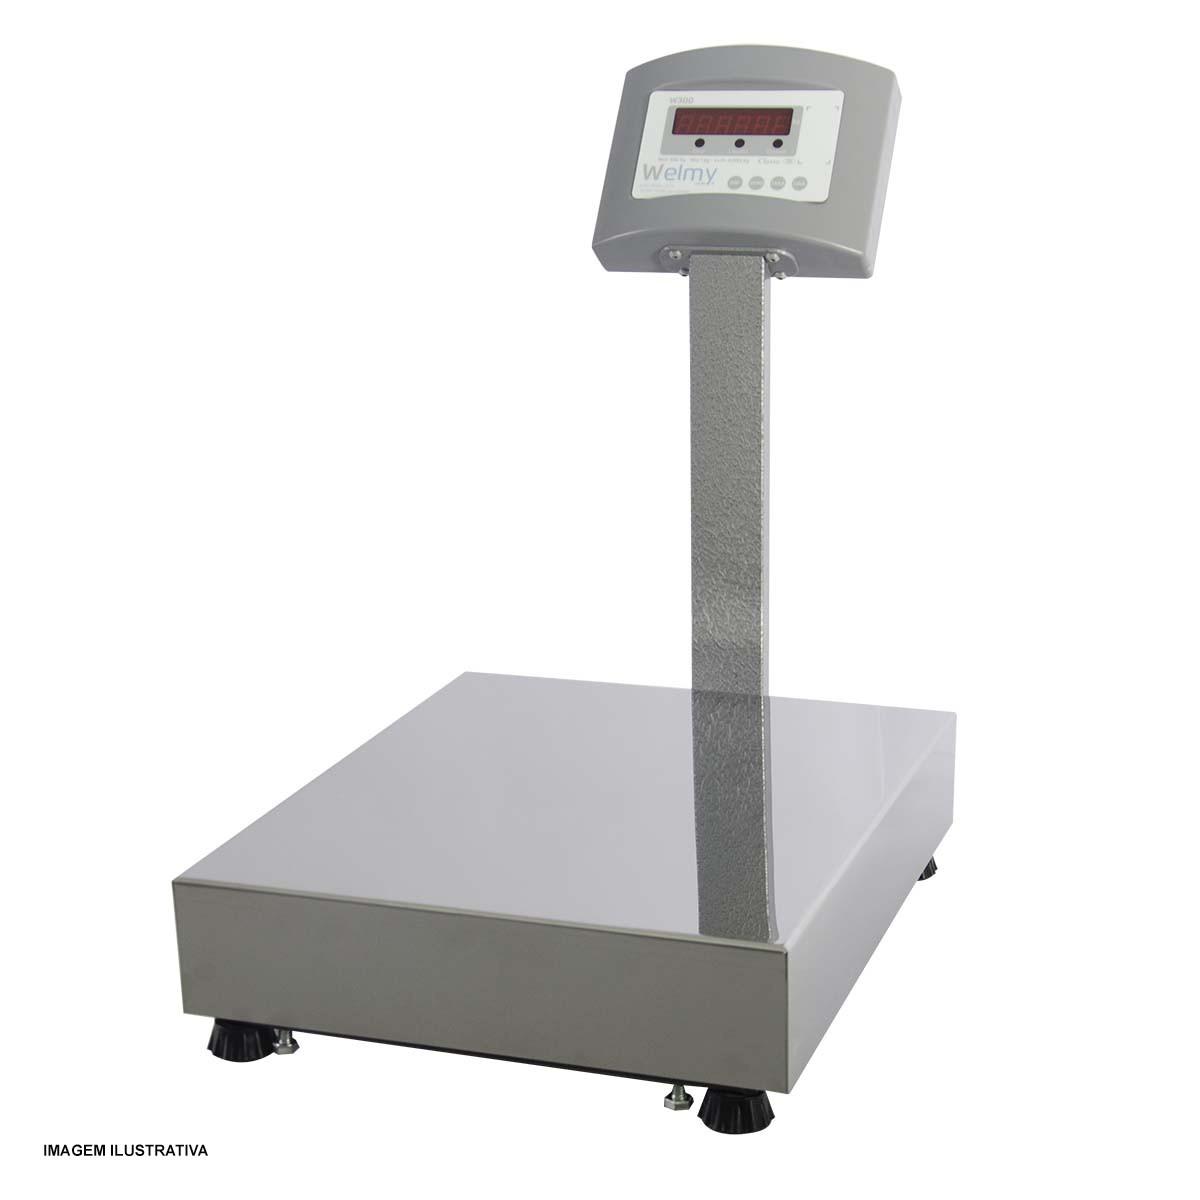 Balança Eletrônica 100Kg, 20g W100 Welmy